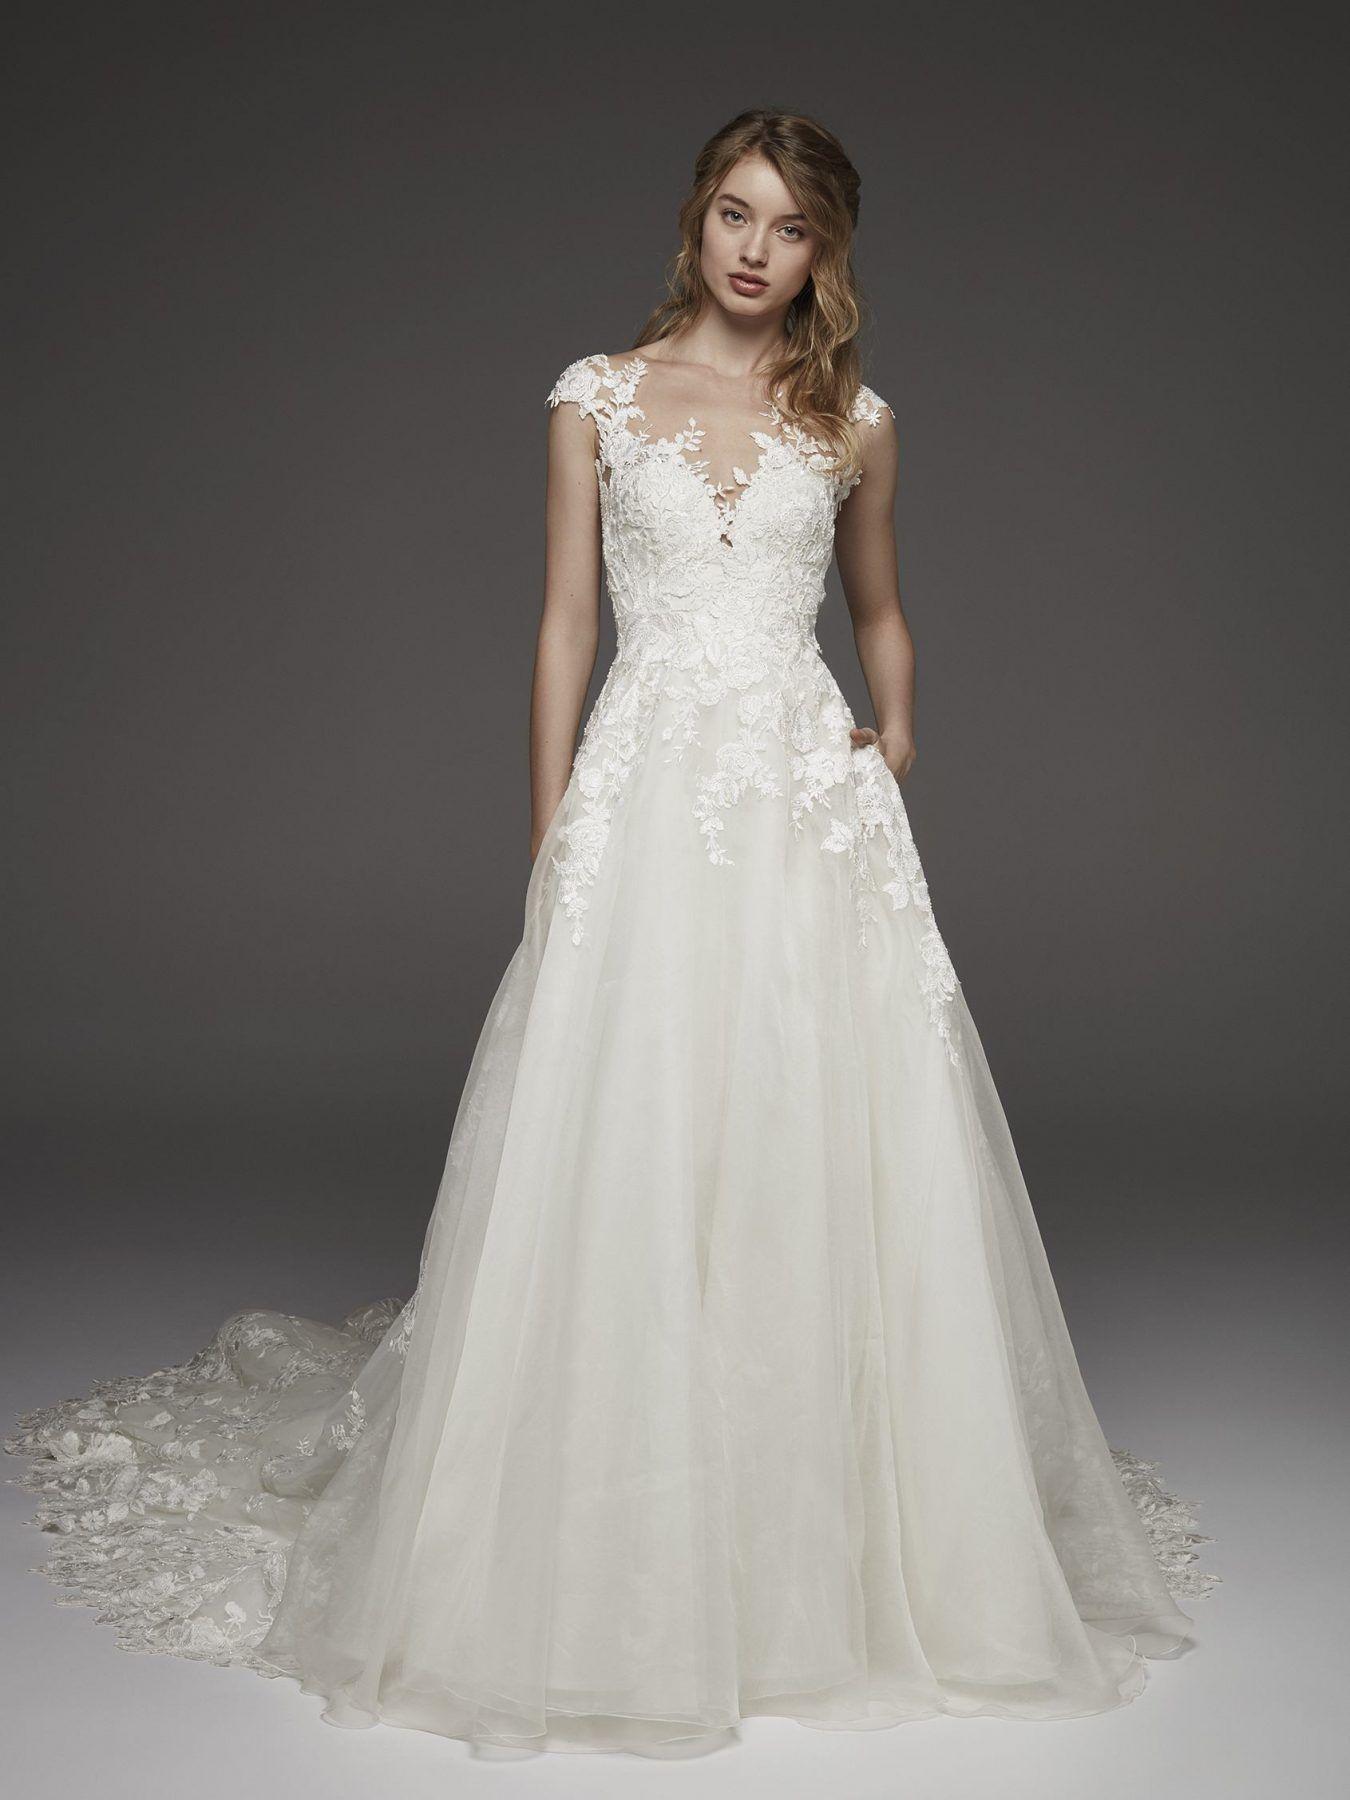 Lace cap sleeve a line wedding dress  Illusion lace cap sleeve Aline wedding dress  Pronovias  Style